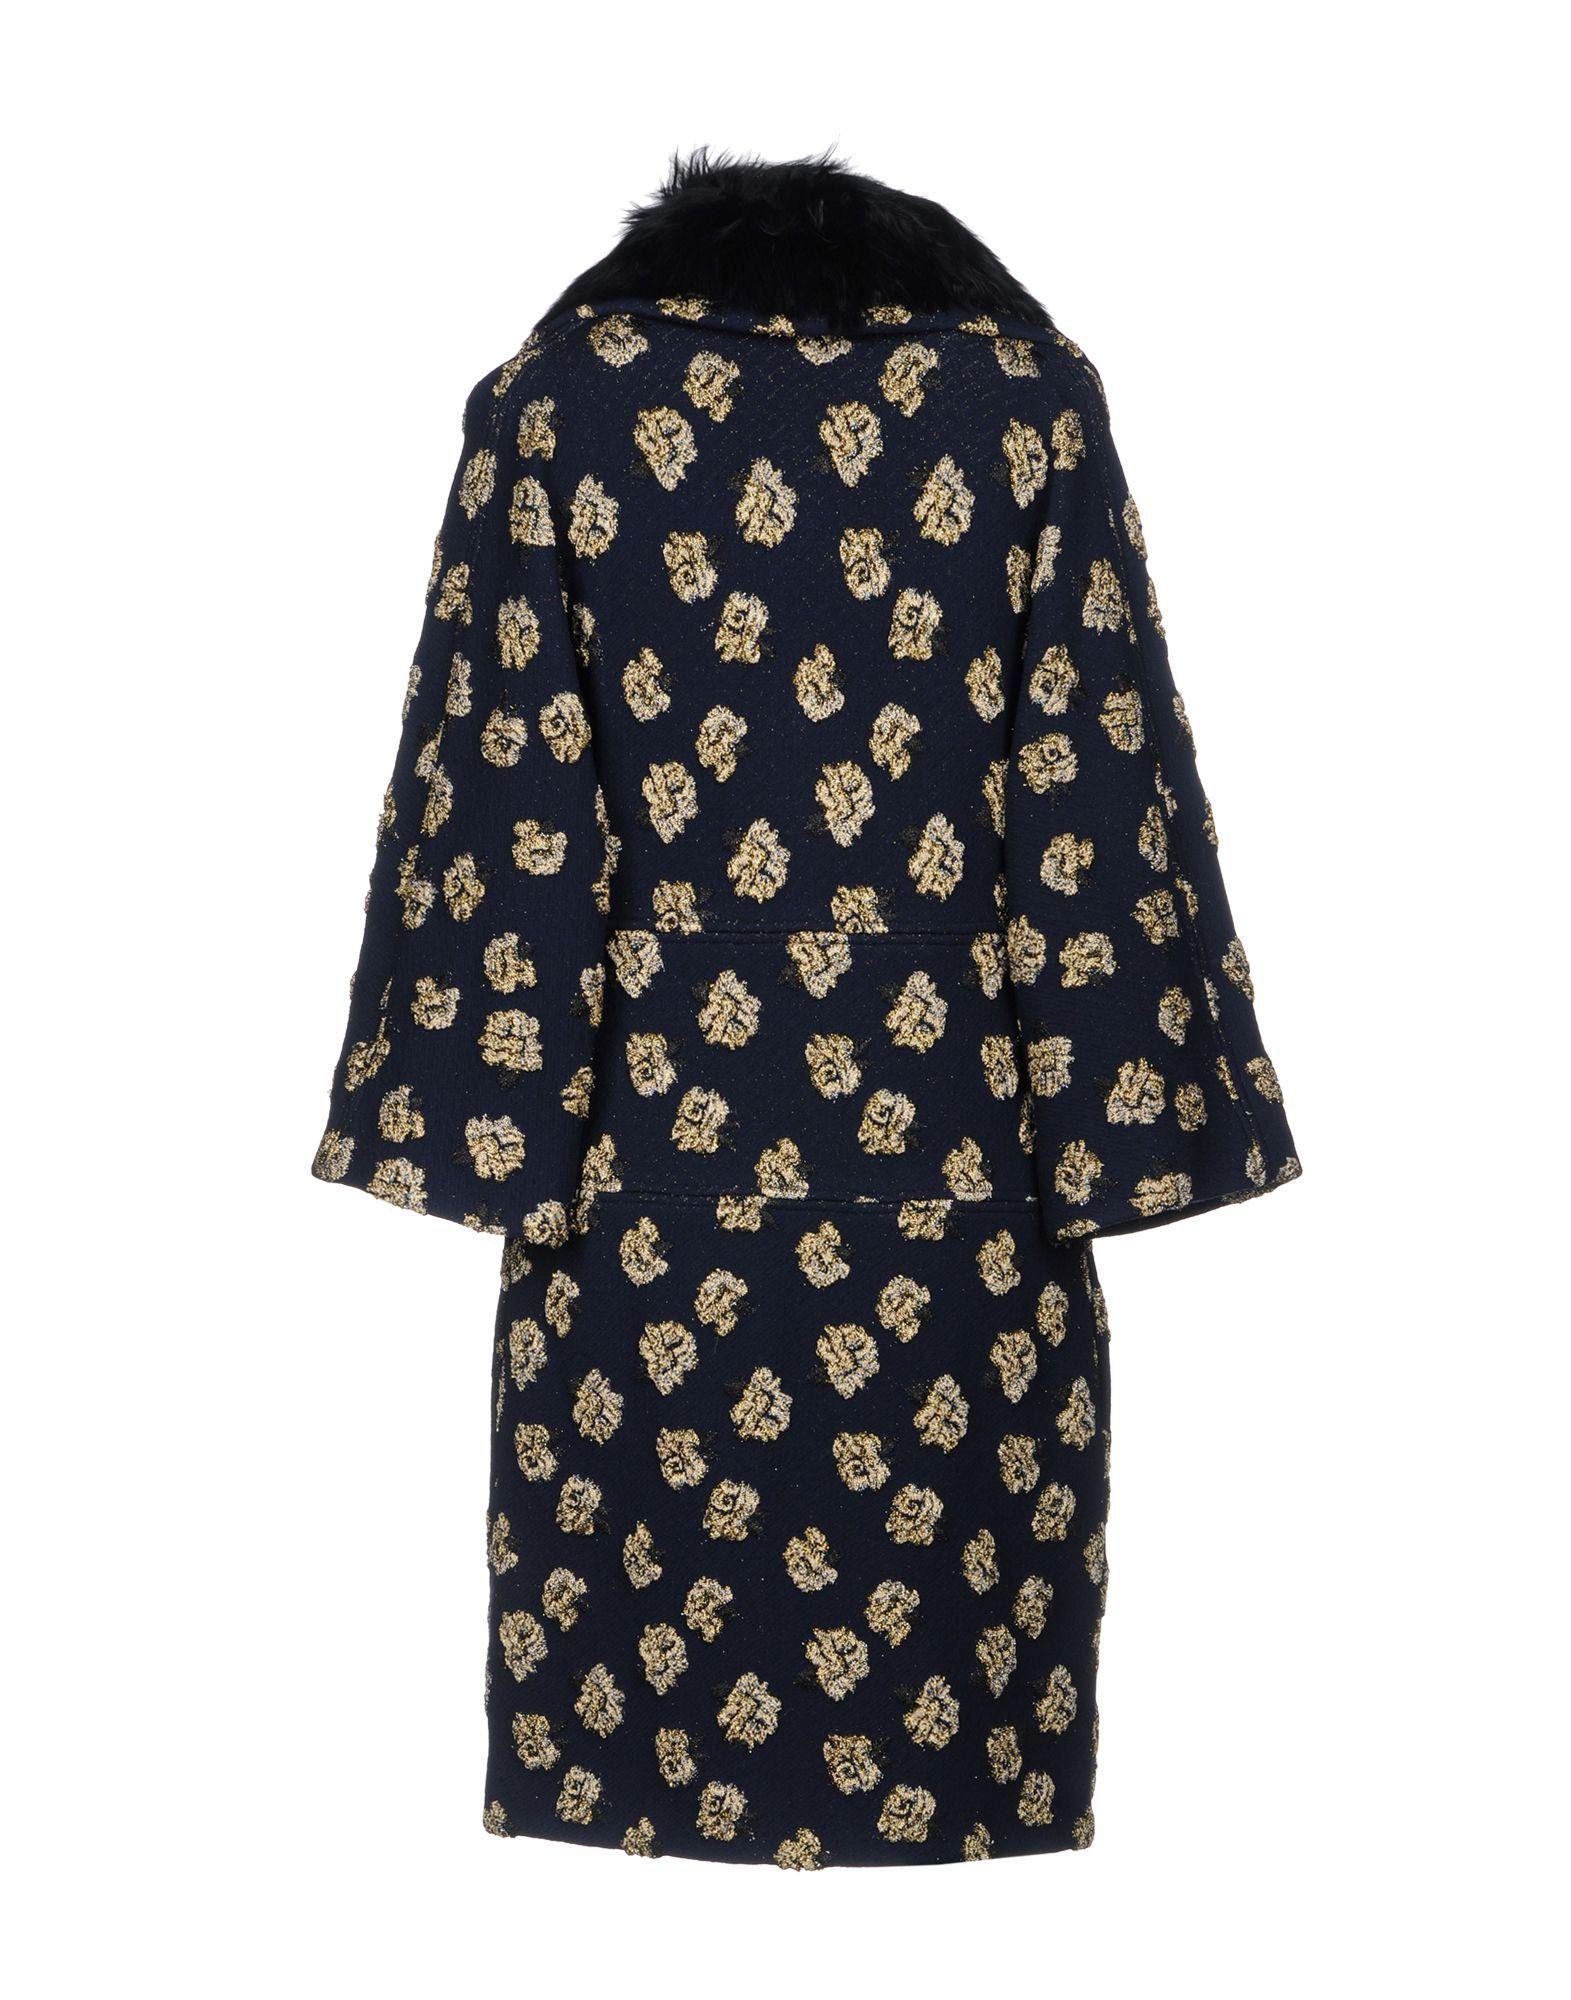 Blumarine Dark Blue Print Coat